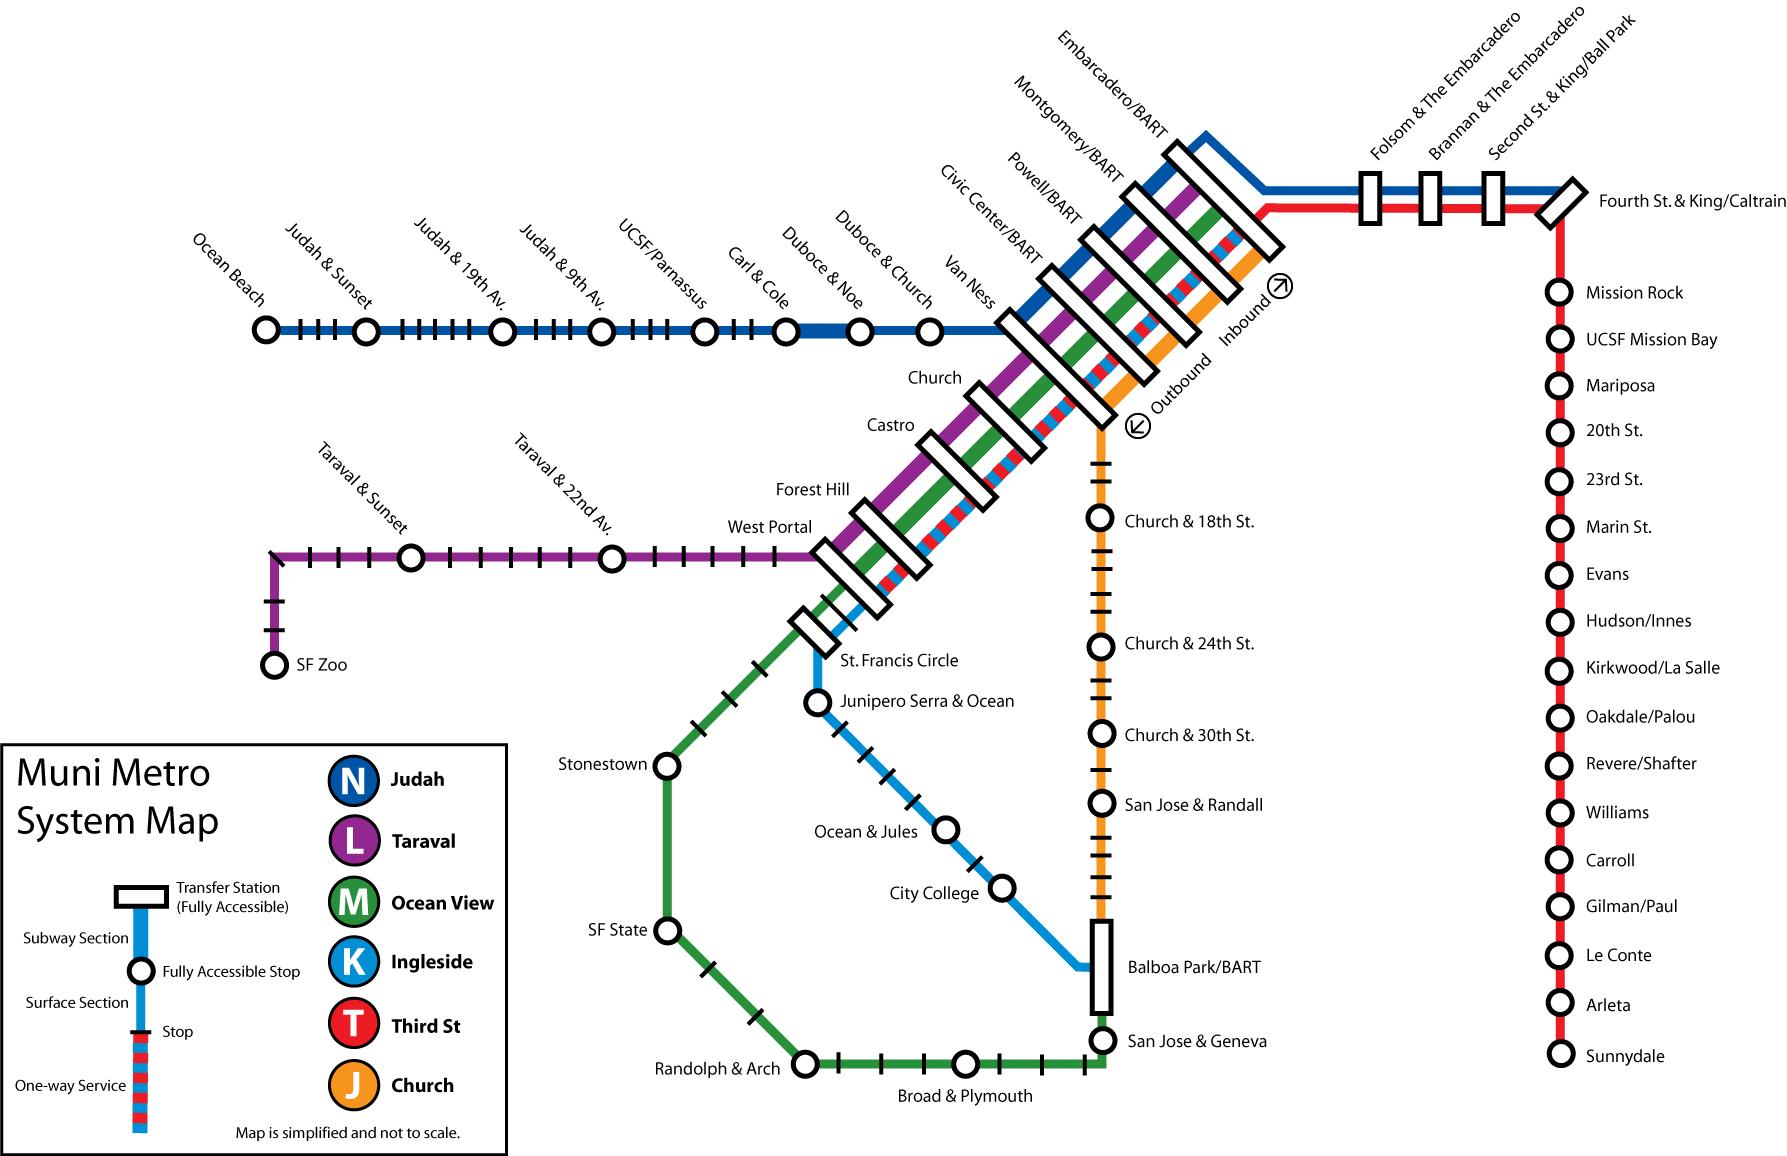 San Francisco Muni Metro Map.File Muni Metro Png Wikimedia Commons